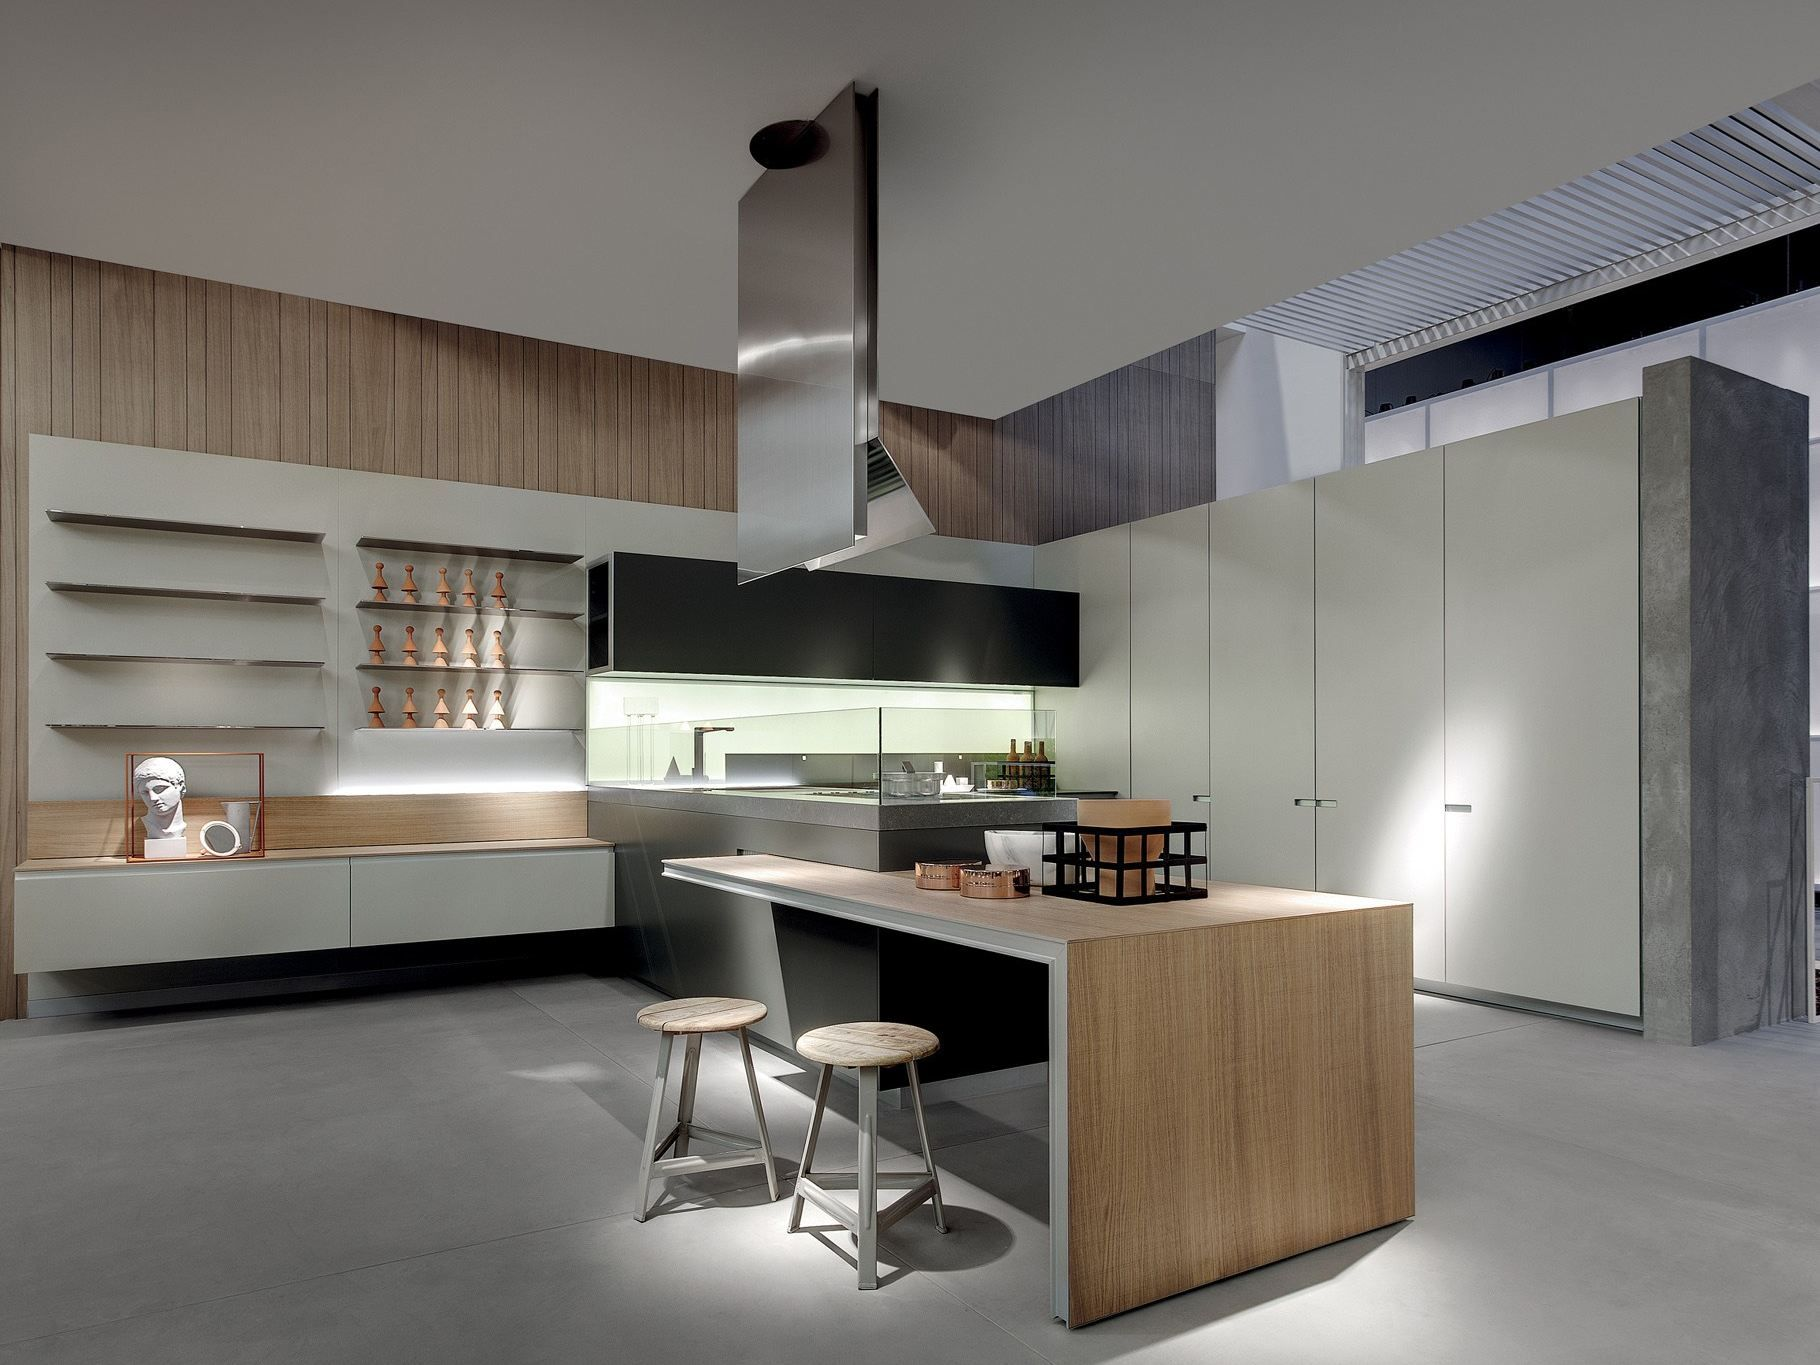 Cucina senza maniglie ICON by ERNESTOMEDA design Giuseppe Bavuso ...